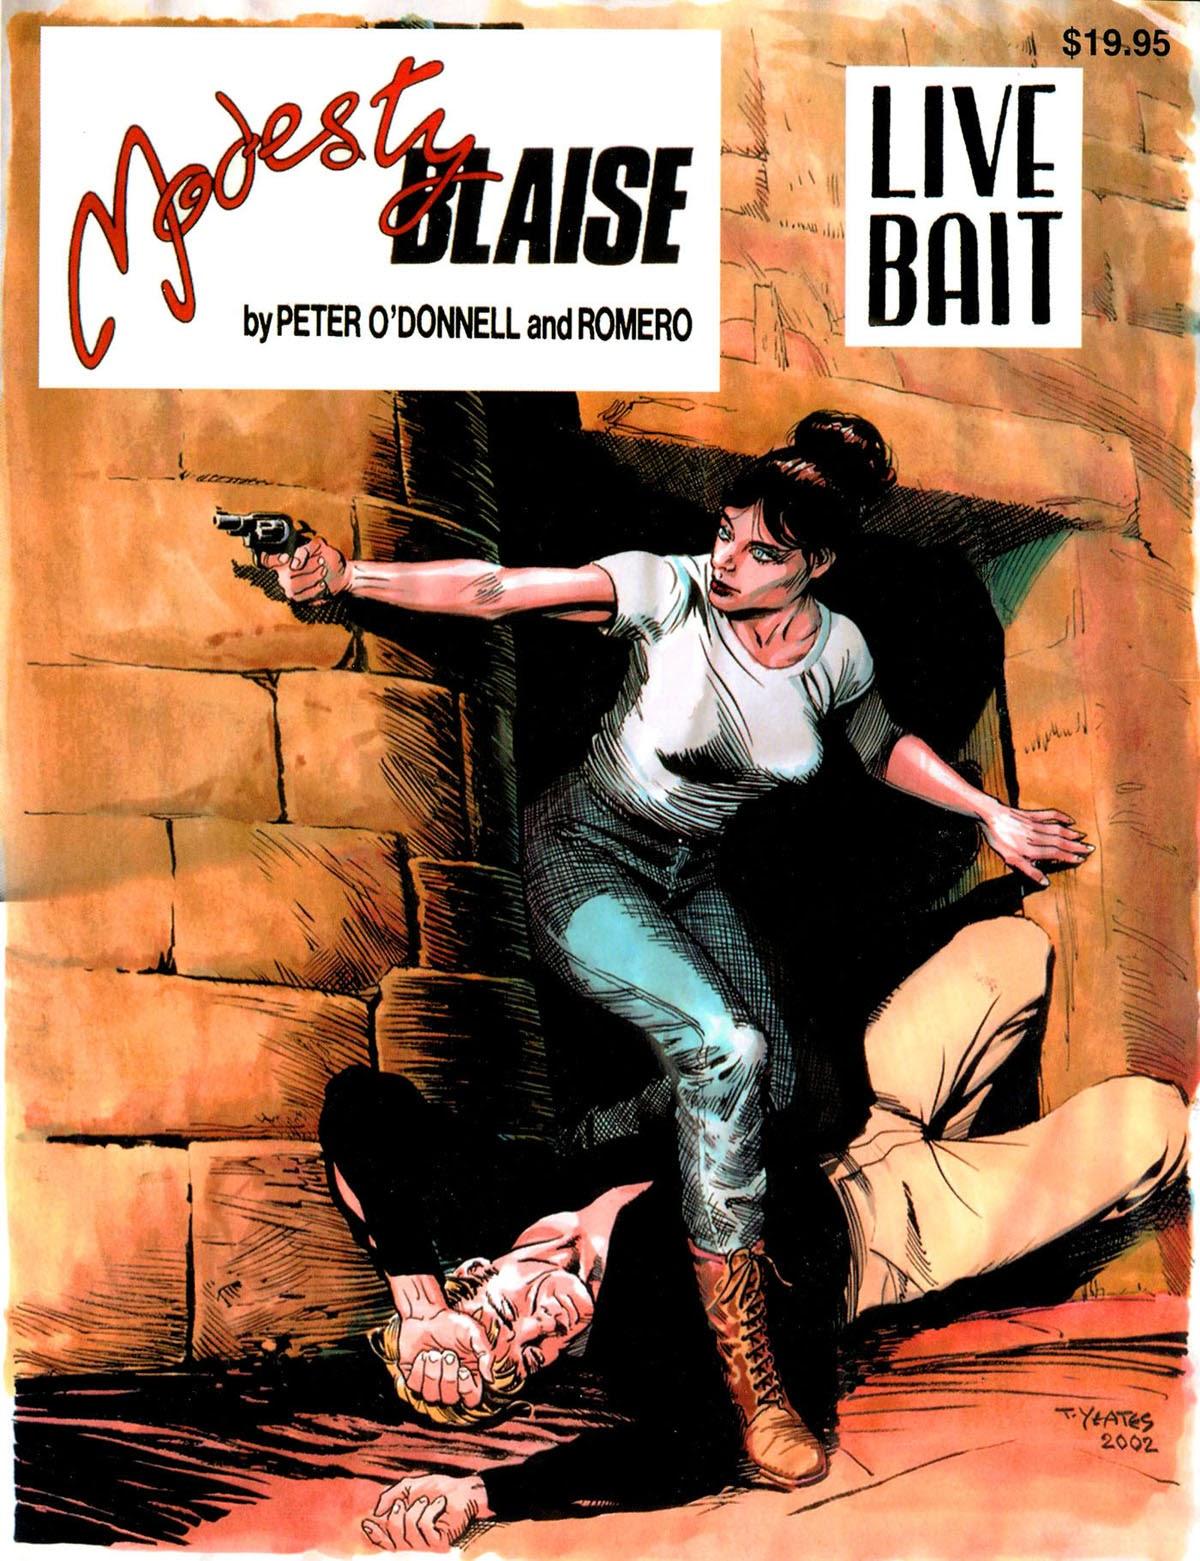 Read online Modesty Blaise Live bait comic -  Issue # TPB - 34